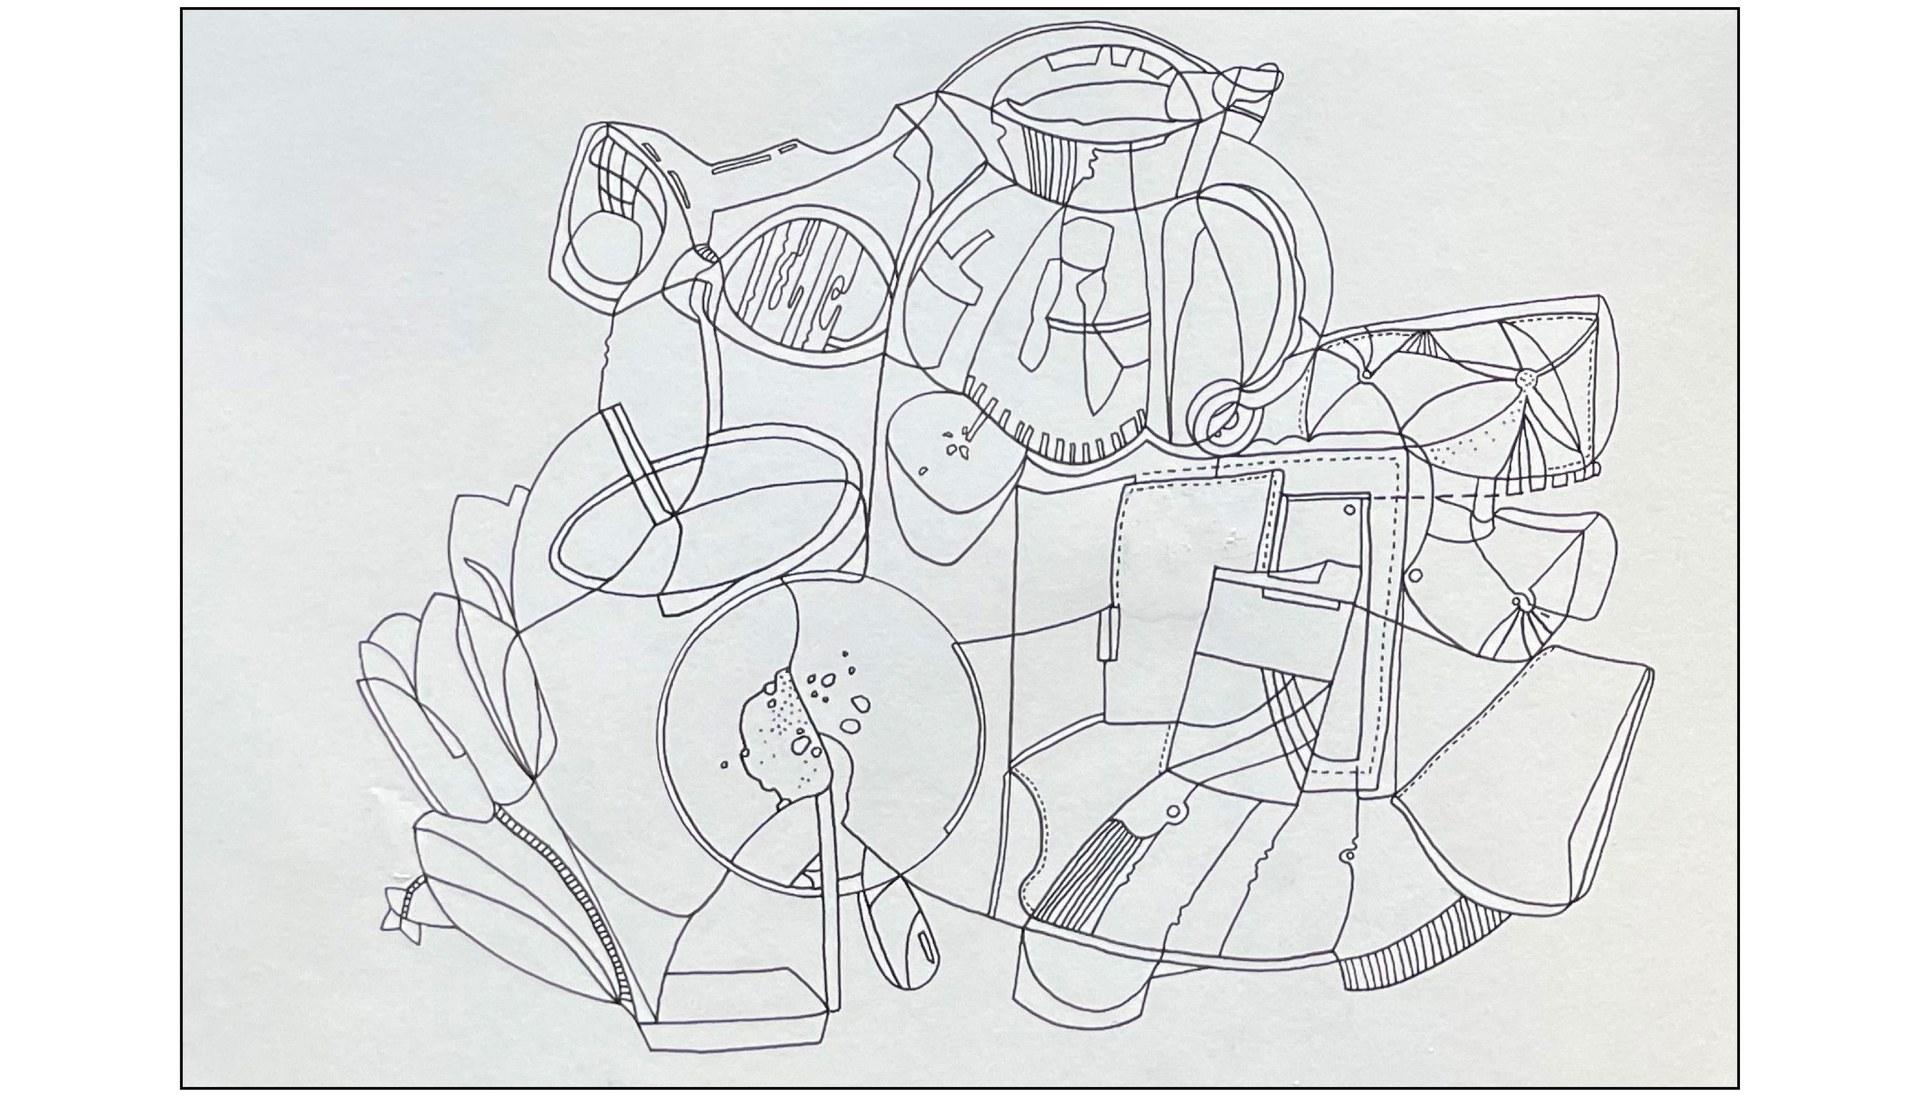 Illustration based on Christine's Objects of Comfort.